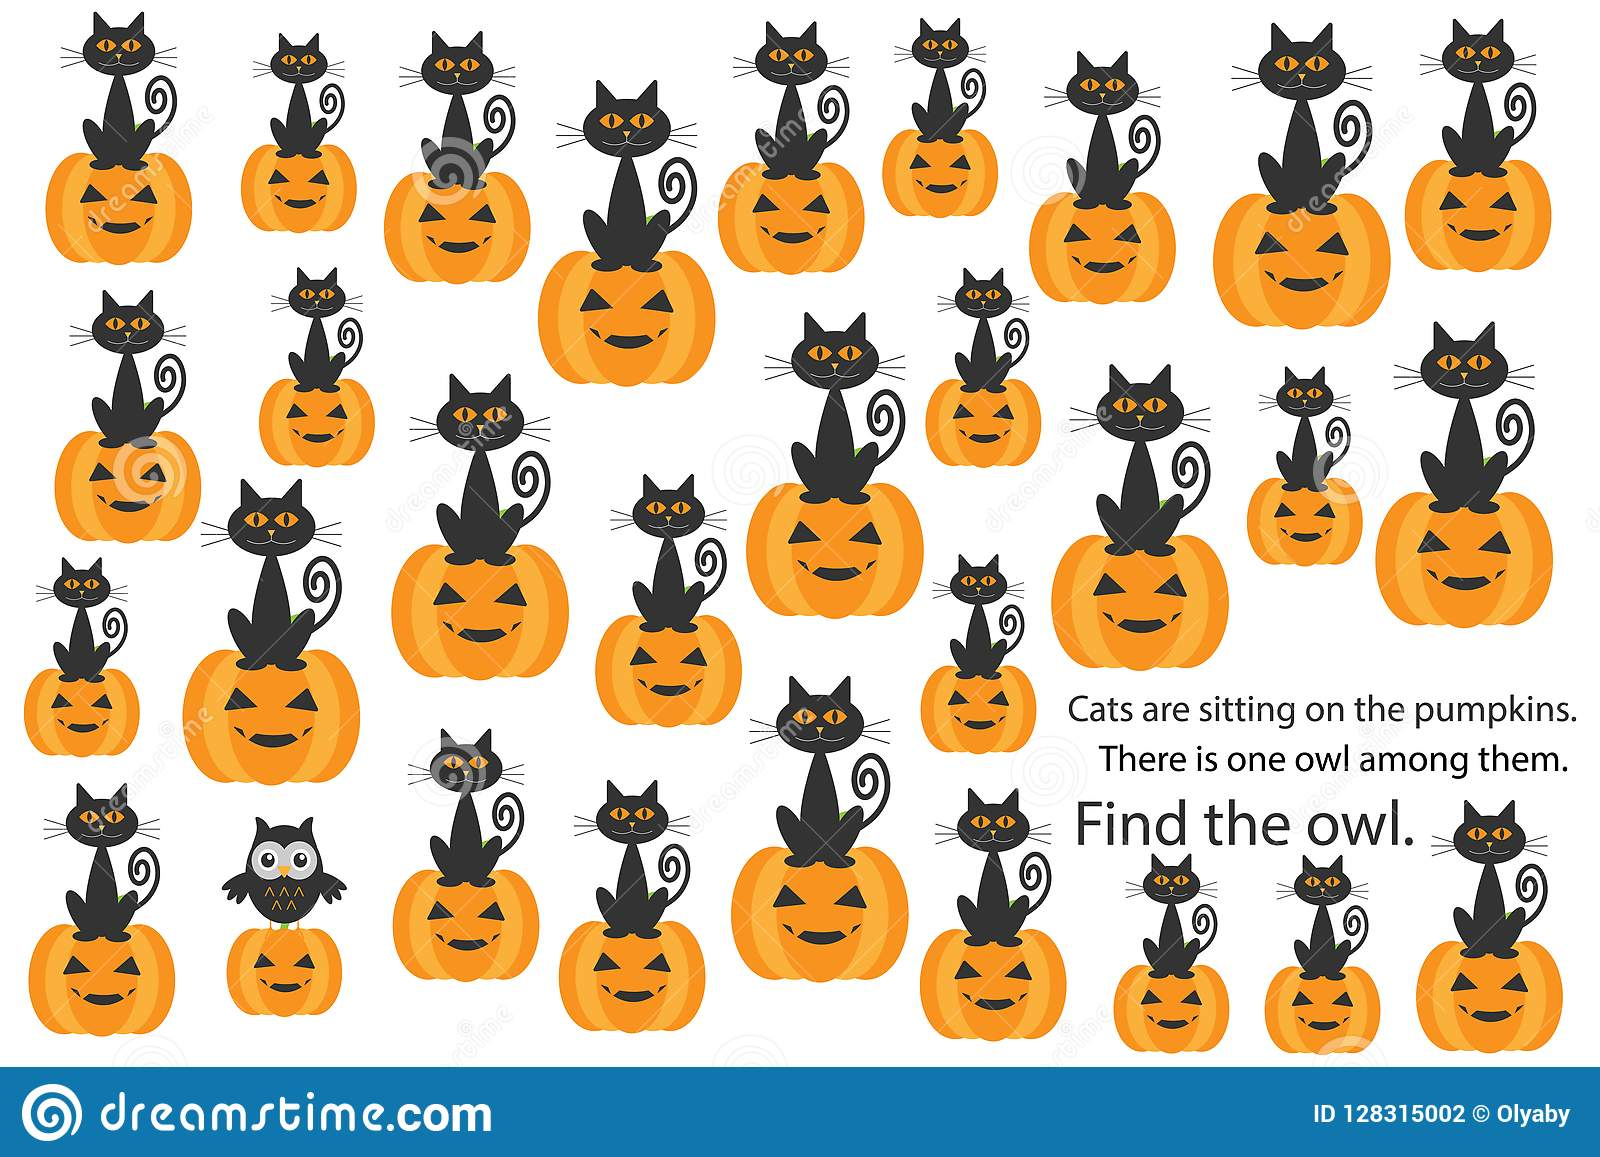 Find Owl Among Cats On Pumpkins Halloween Fun Education